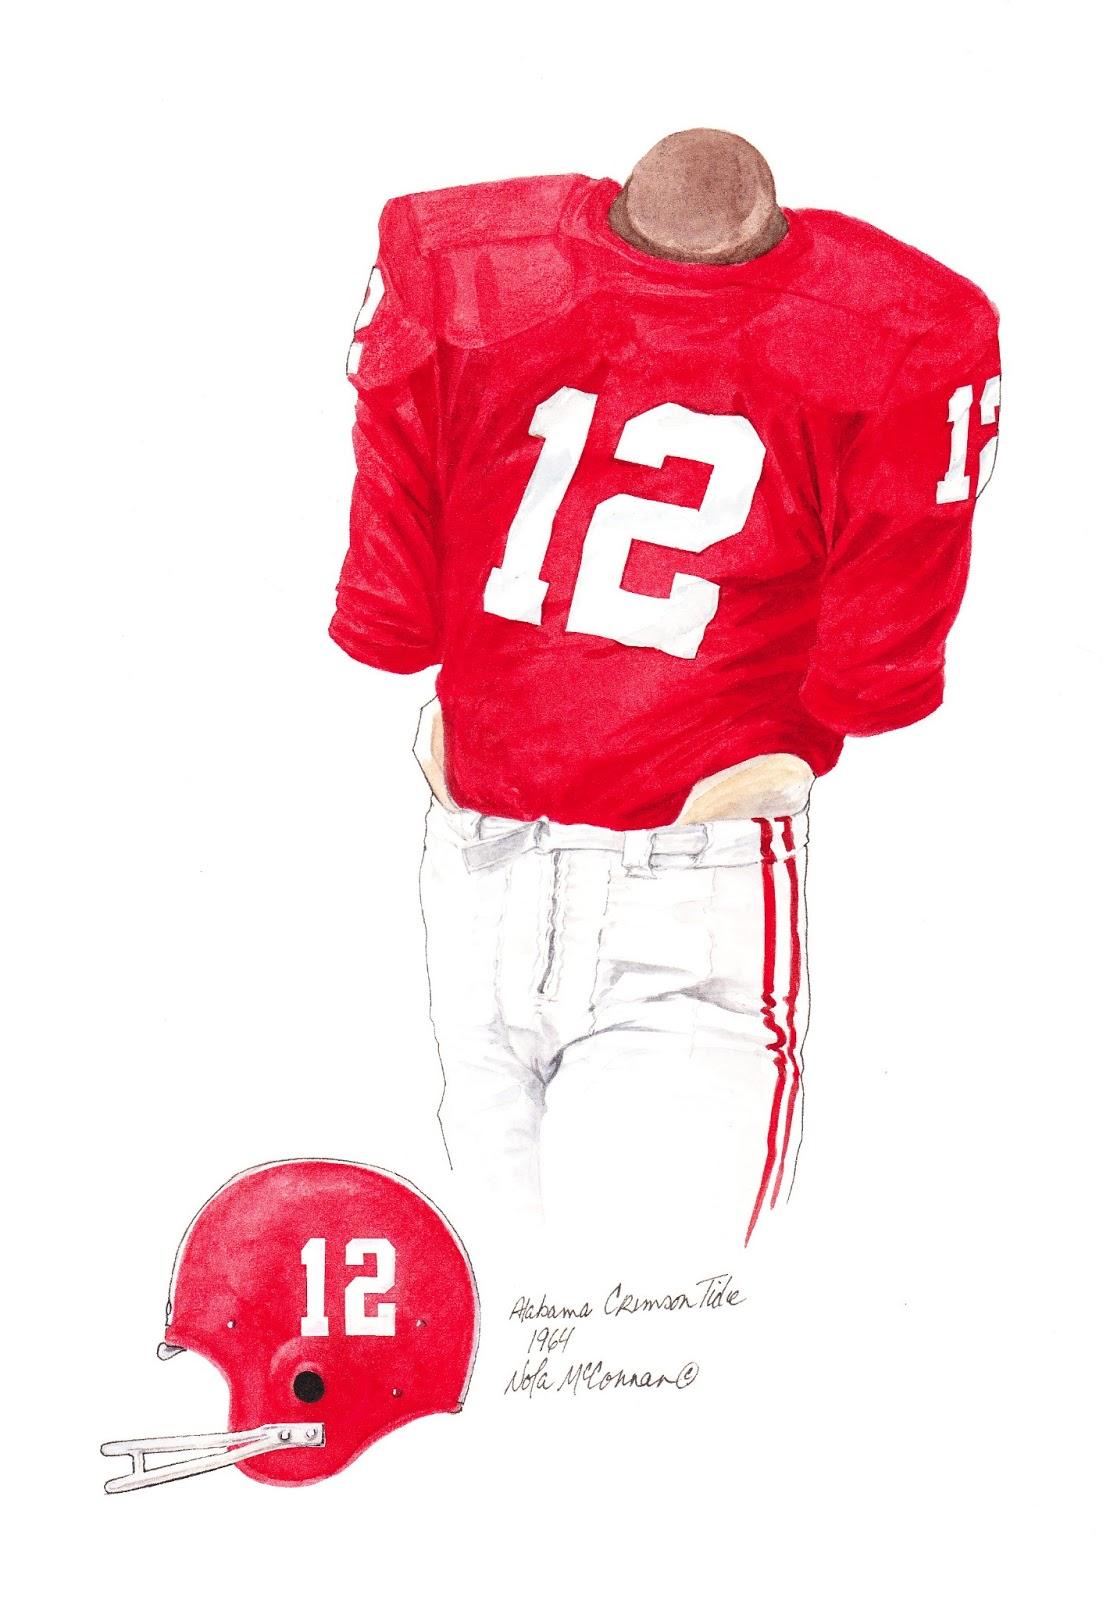 17089dbcc 1964 Alabama Crimson Tide football uniform original art for sale